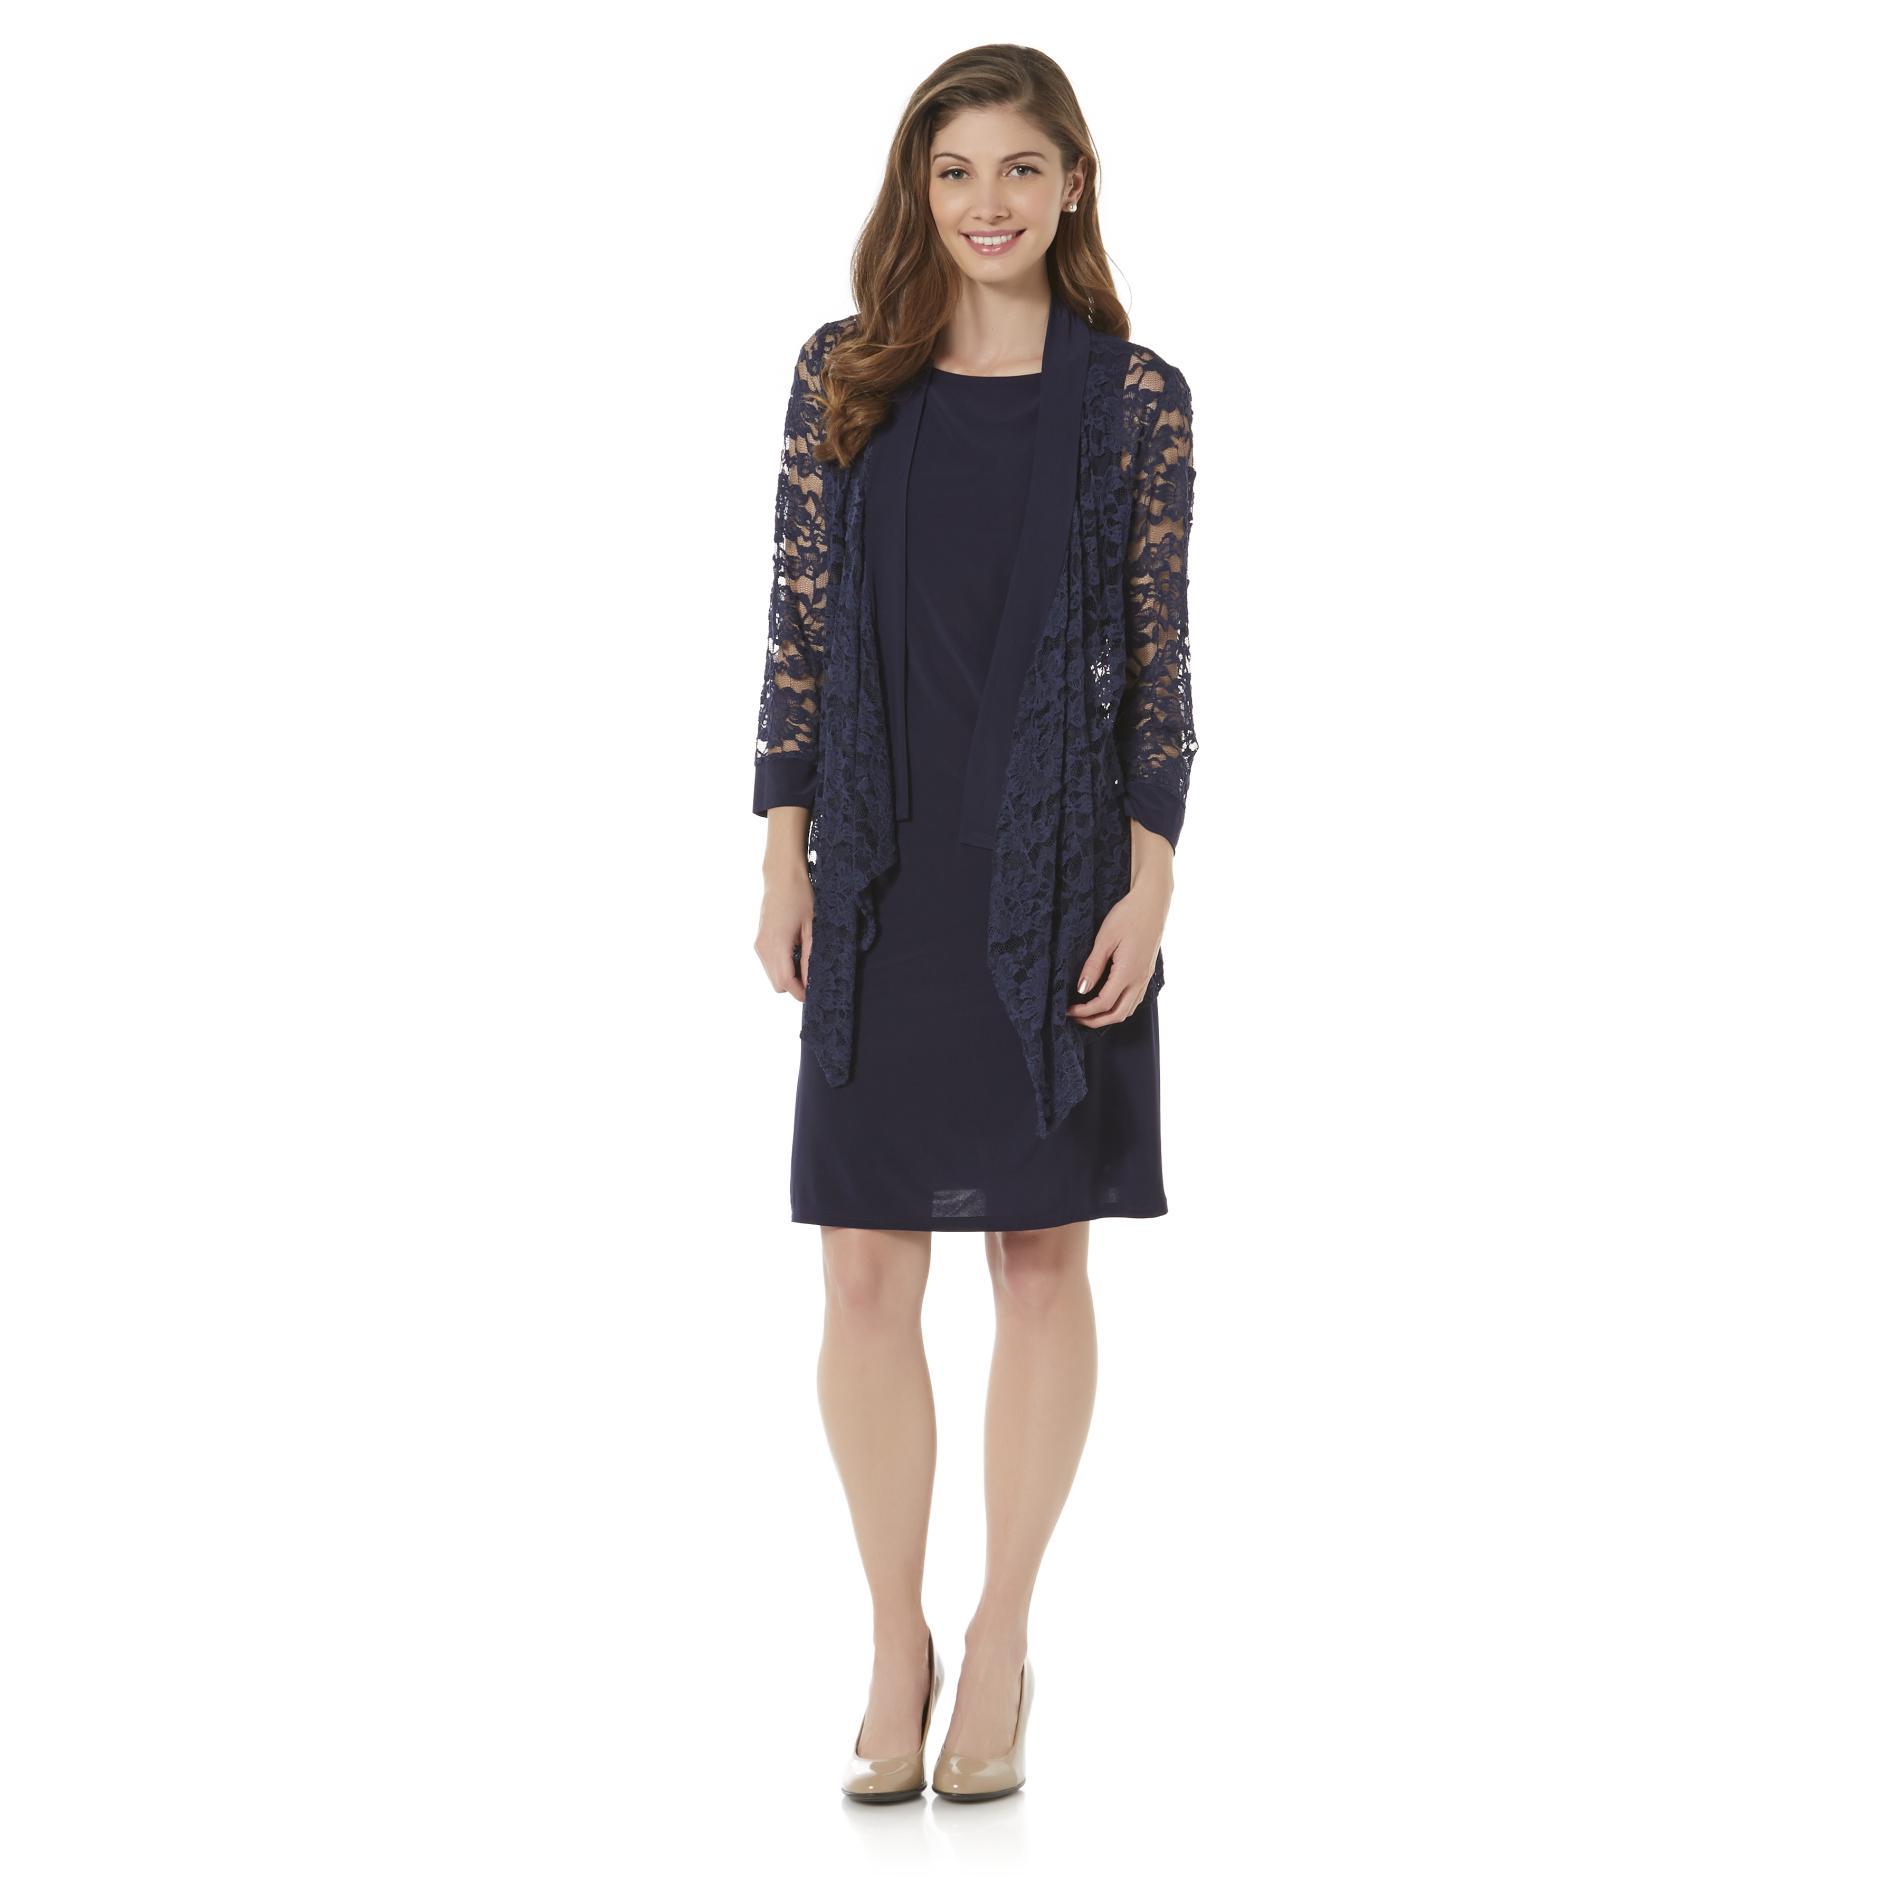 Covington Women 39 S Shift Dress Lace Jacket Sears